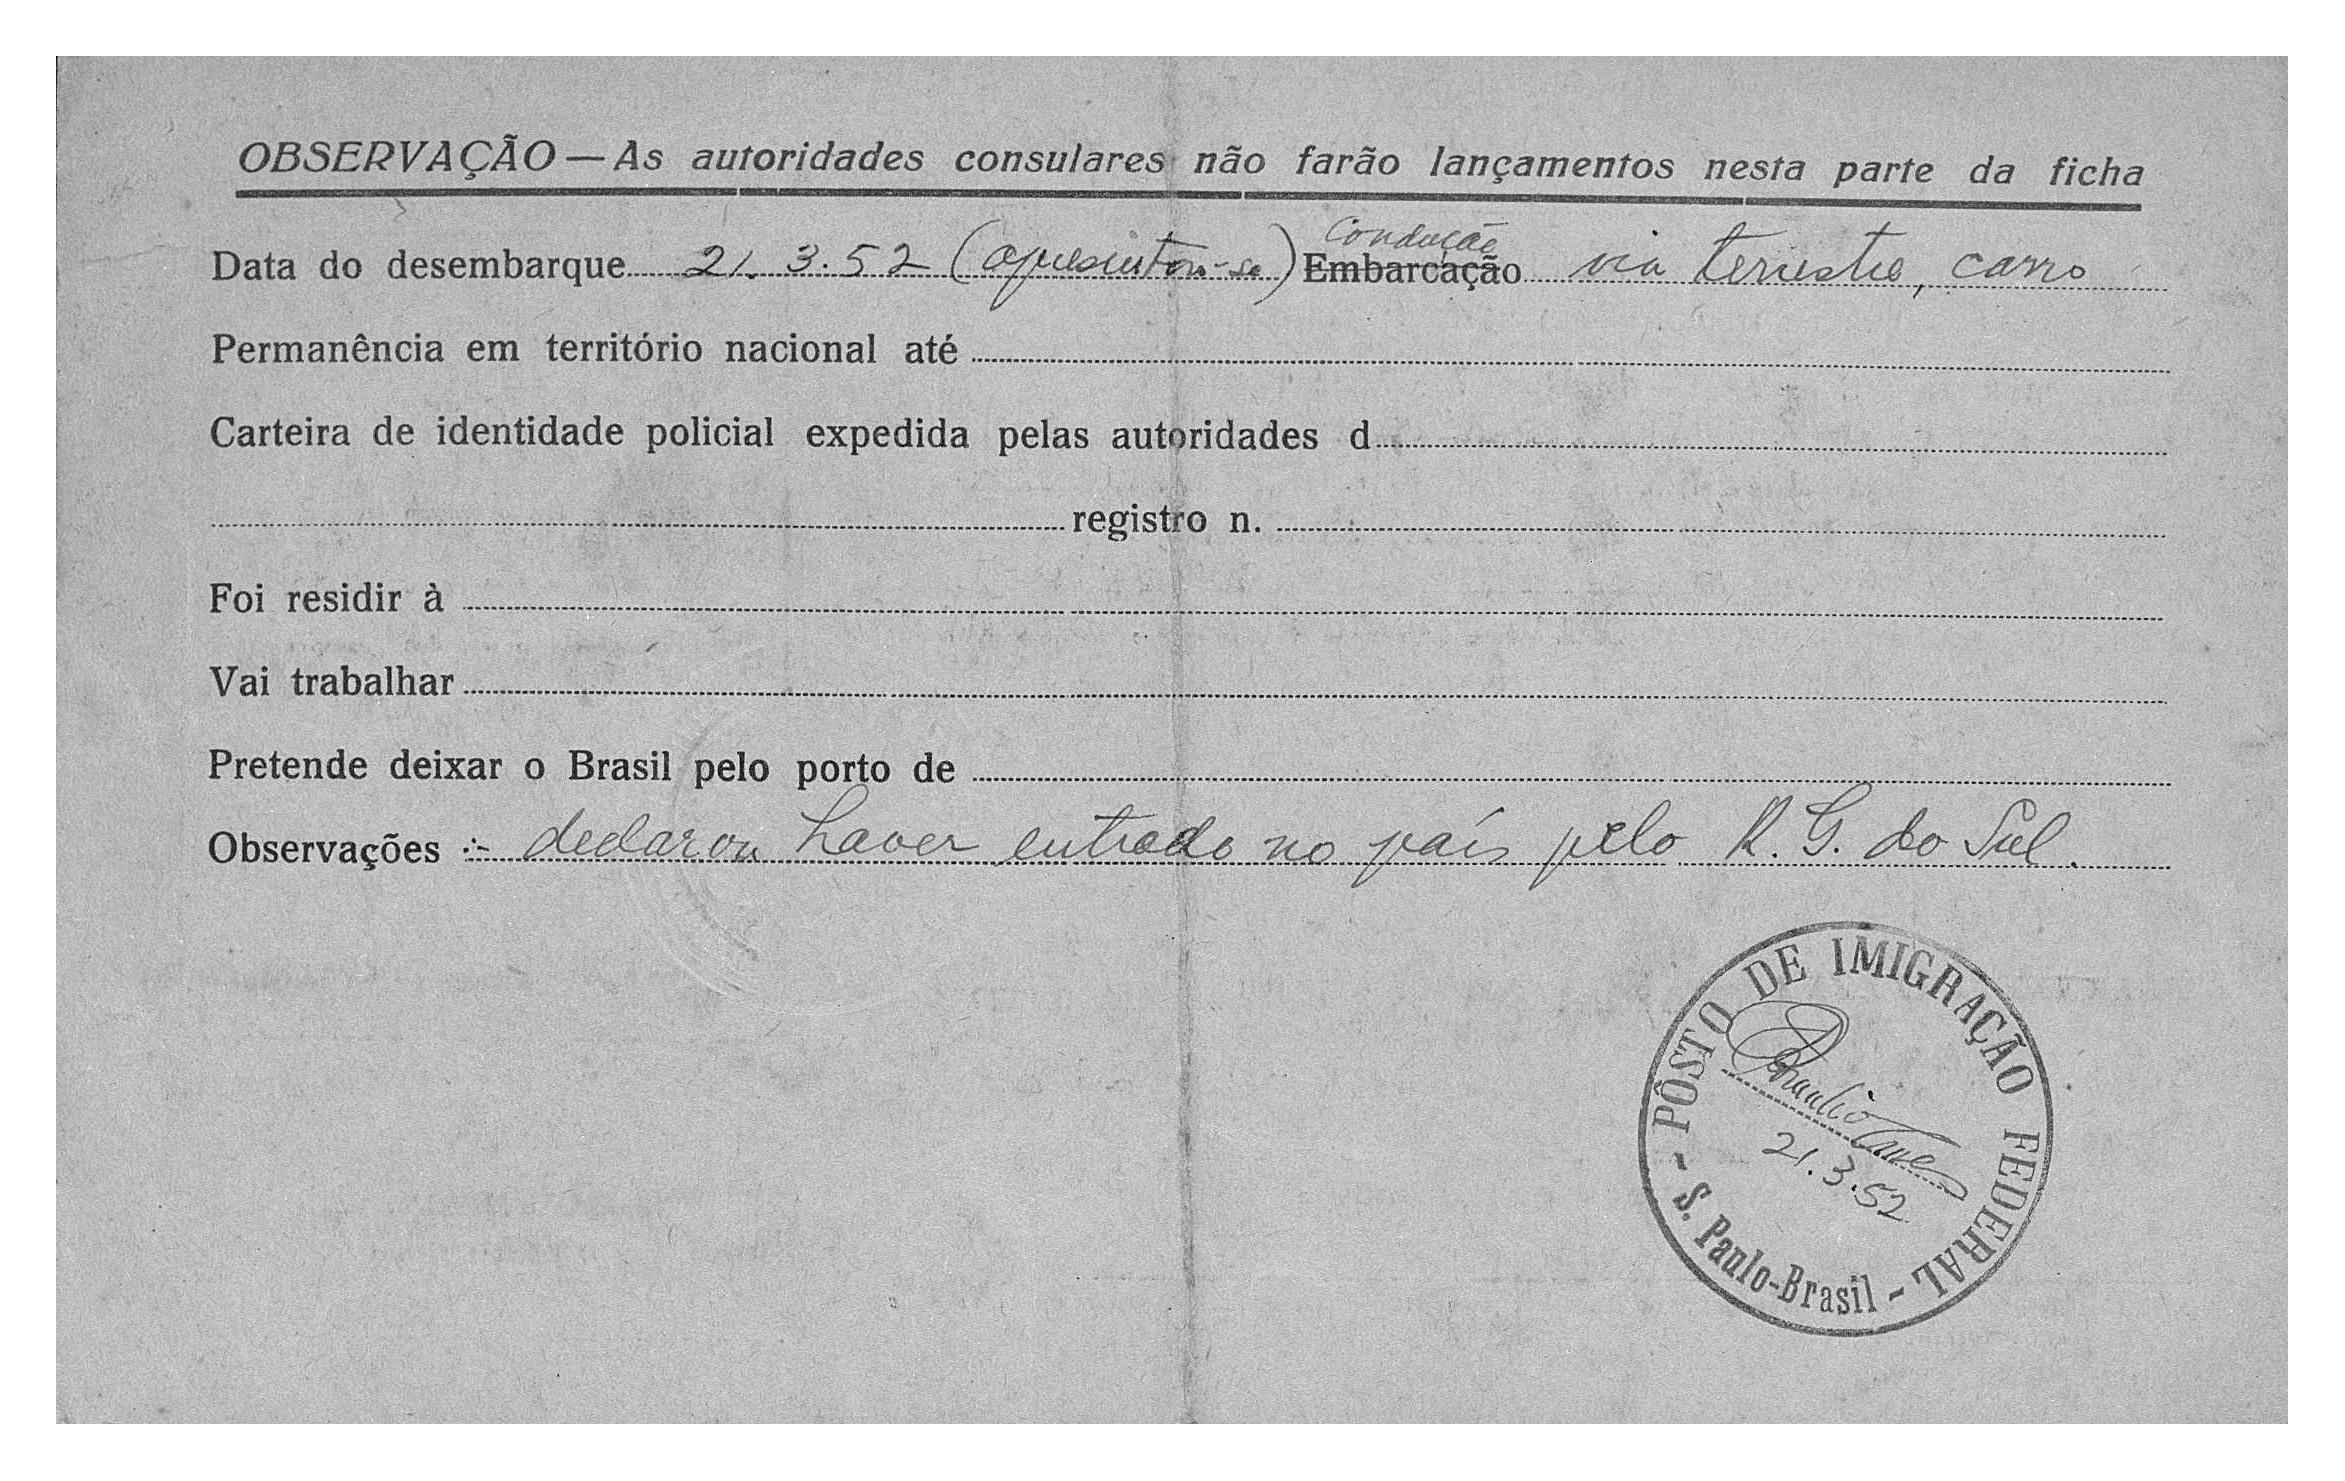 Marco-1951-10-ficha-consular-RJ-02-copy1.jpg